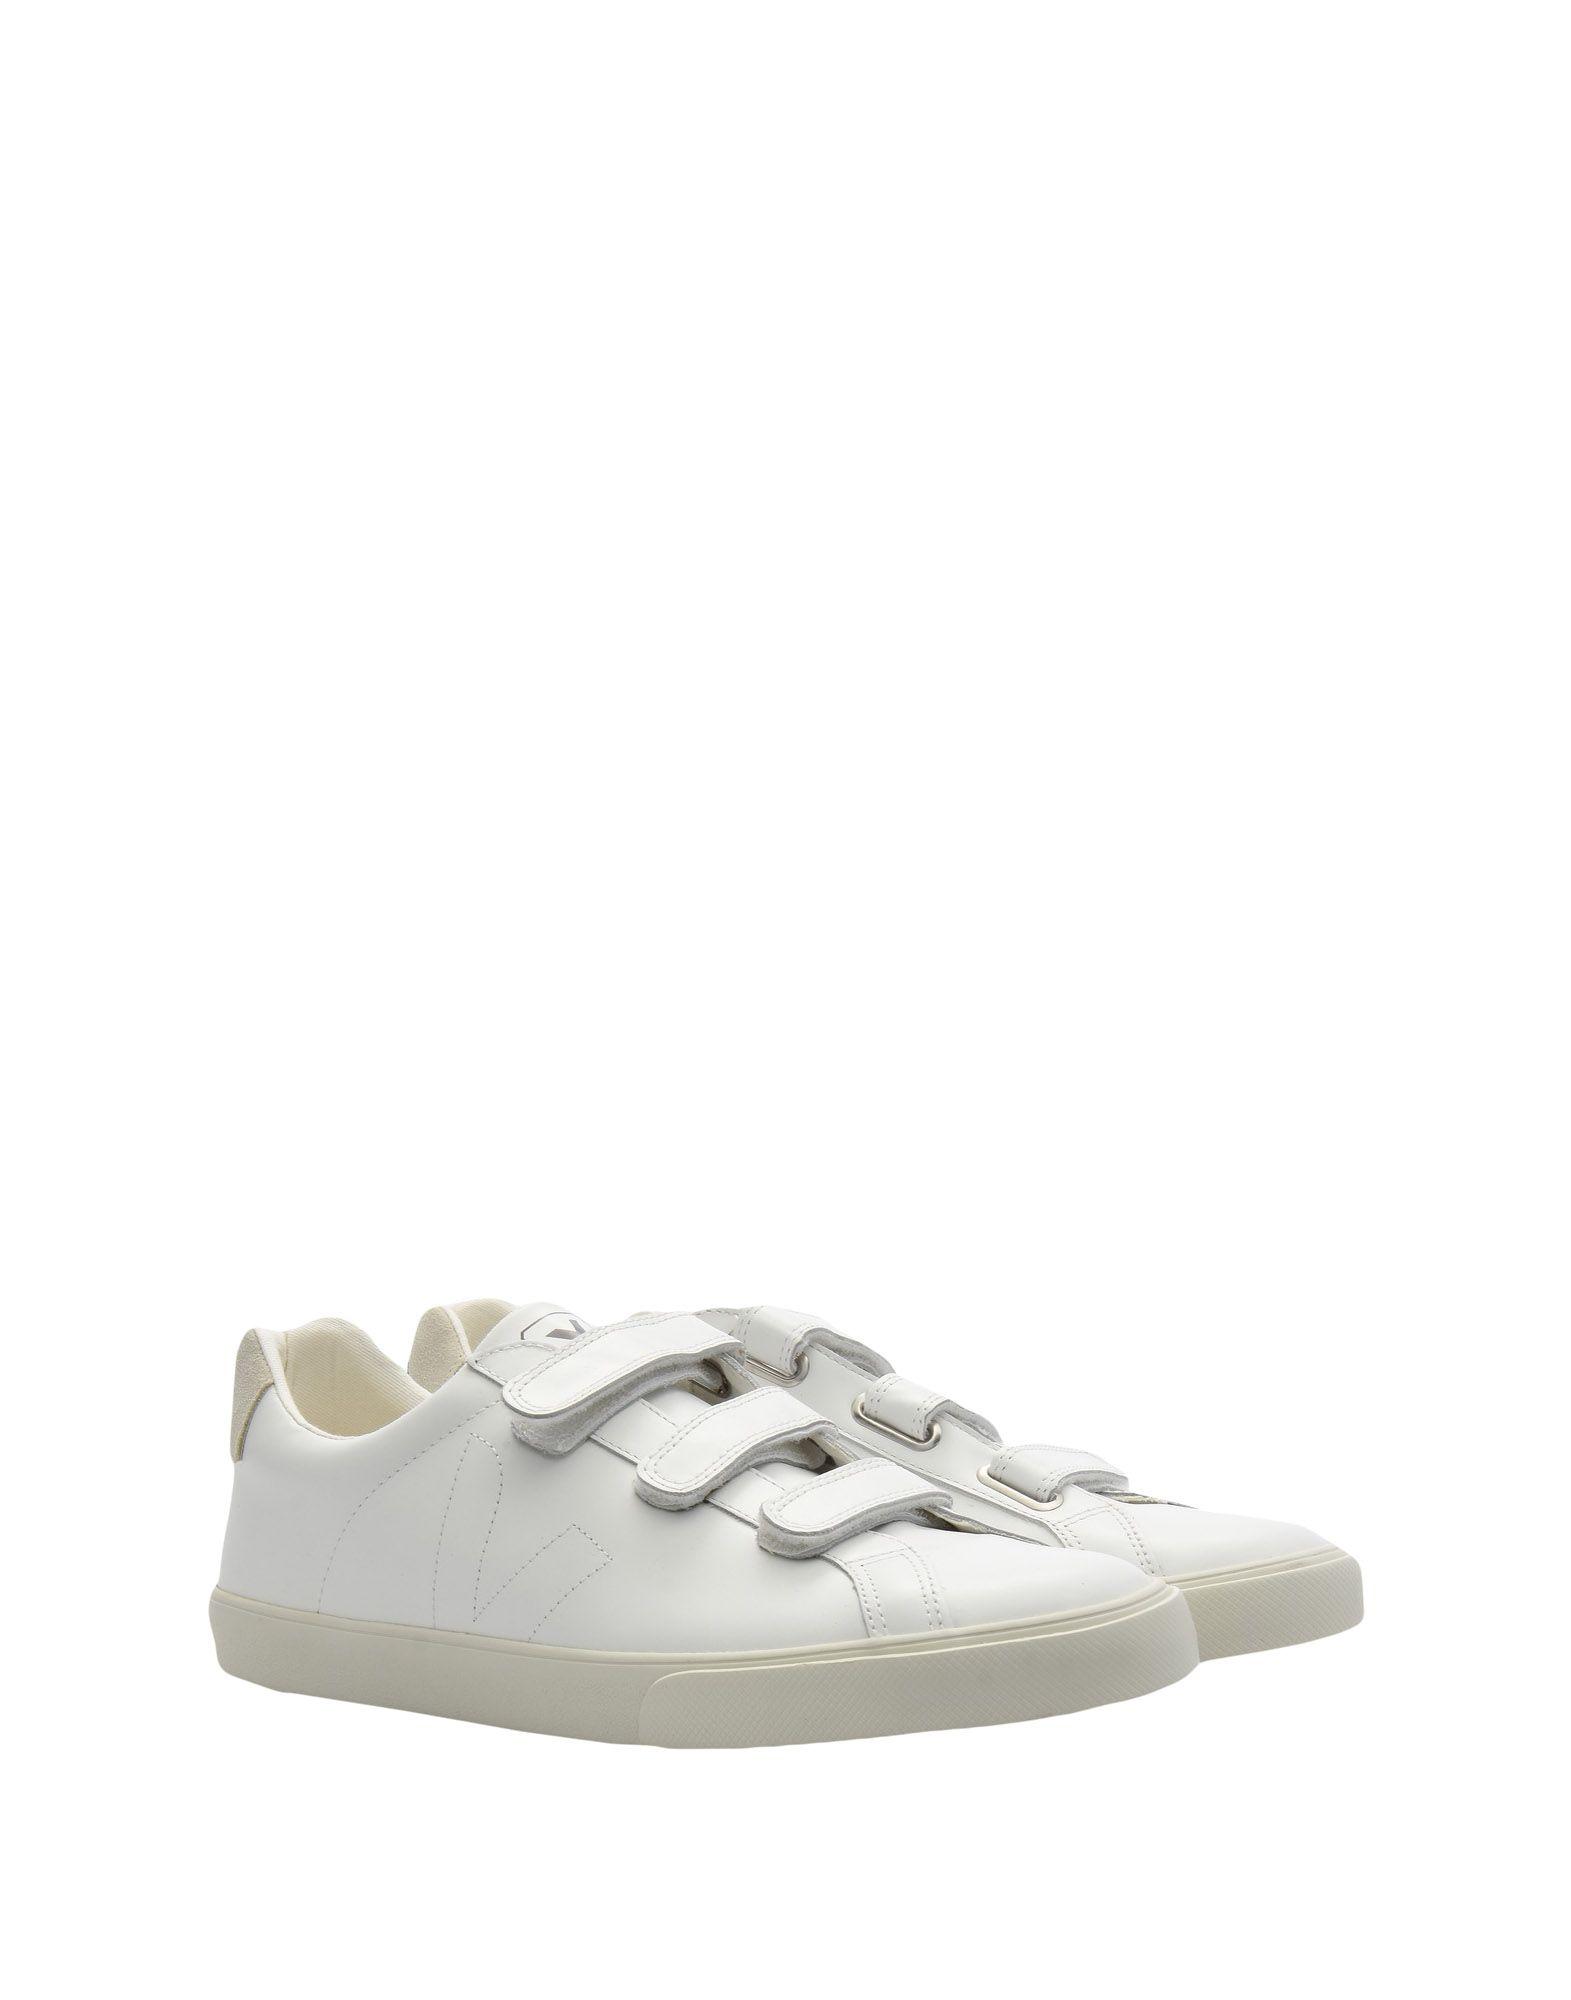 Veja 11448450XI Sneakers Herren  11448450XI Veja Heiße Schuhe ca9e75